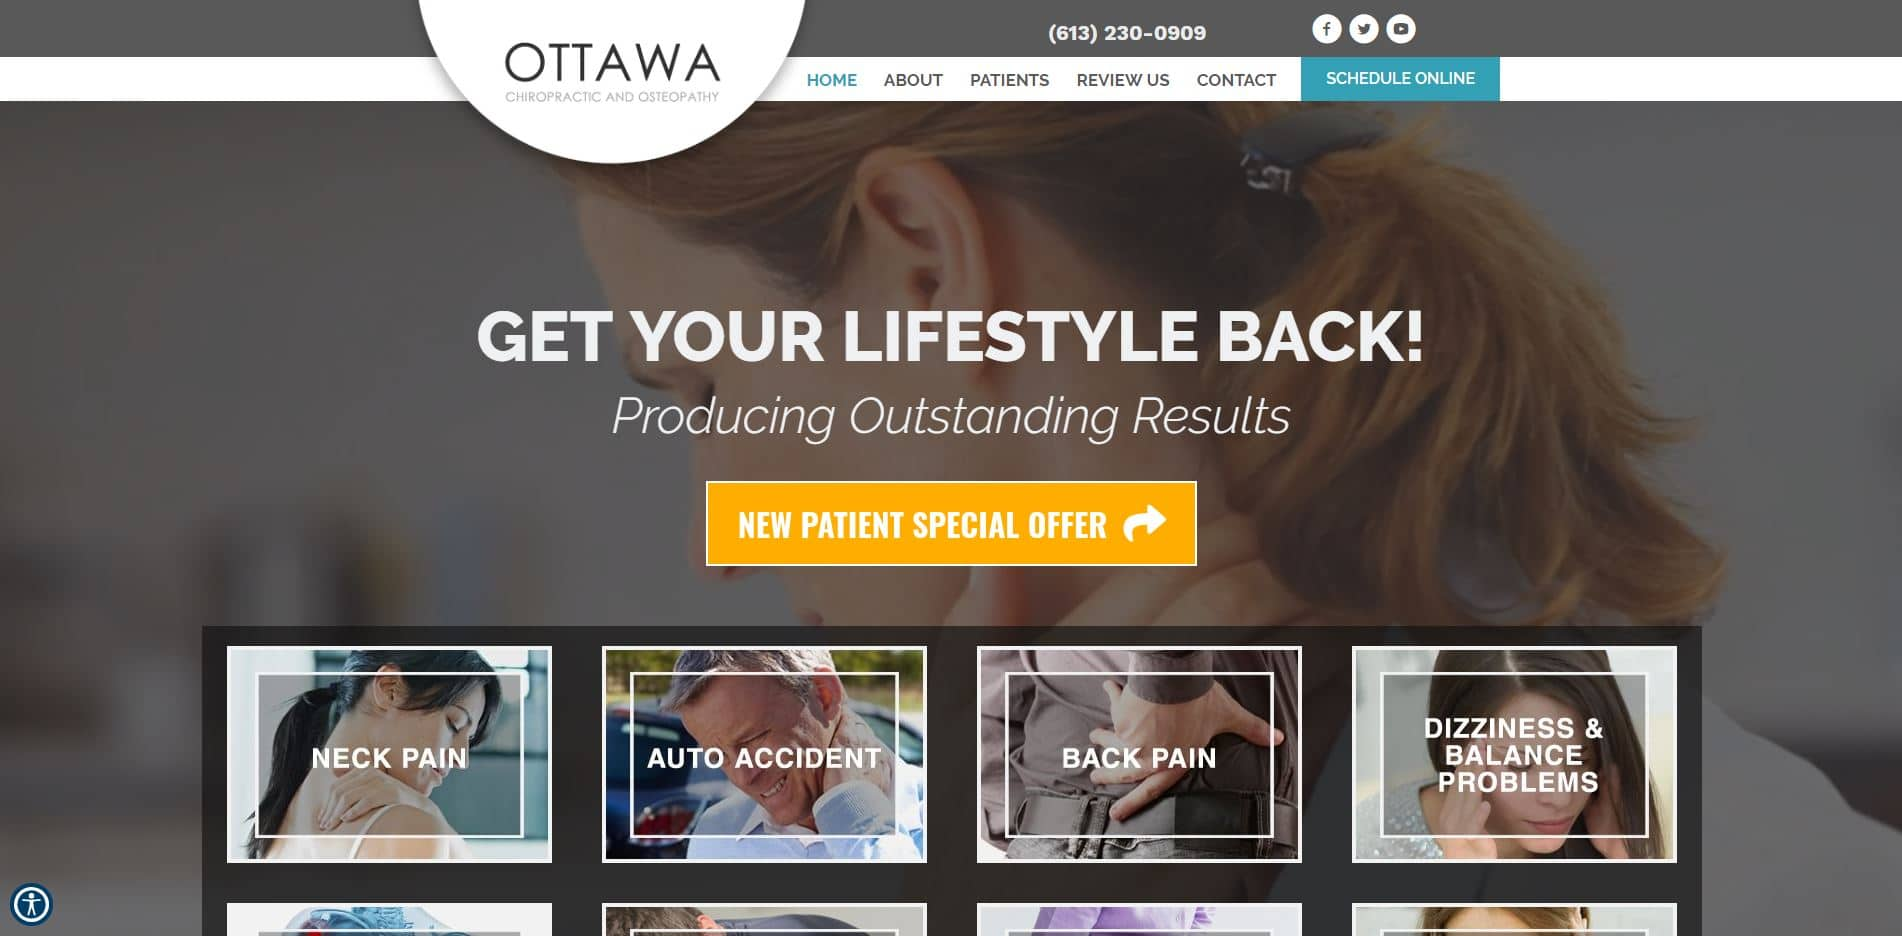 Chiropractor in Ottawa